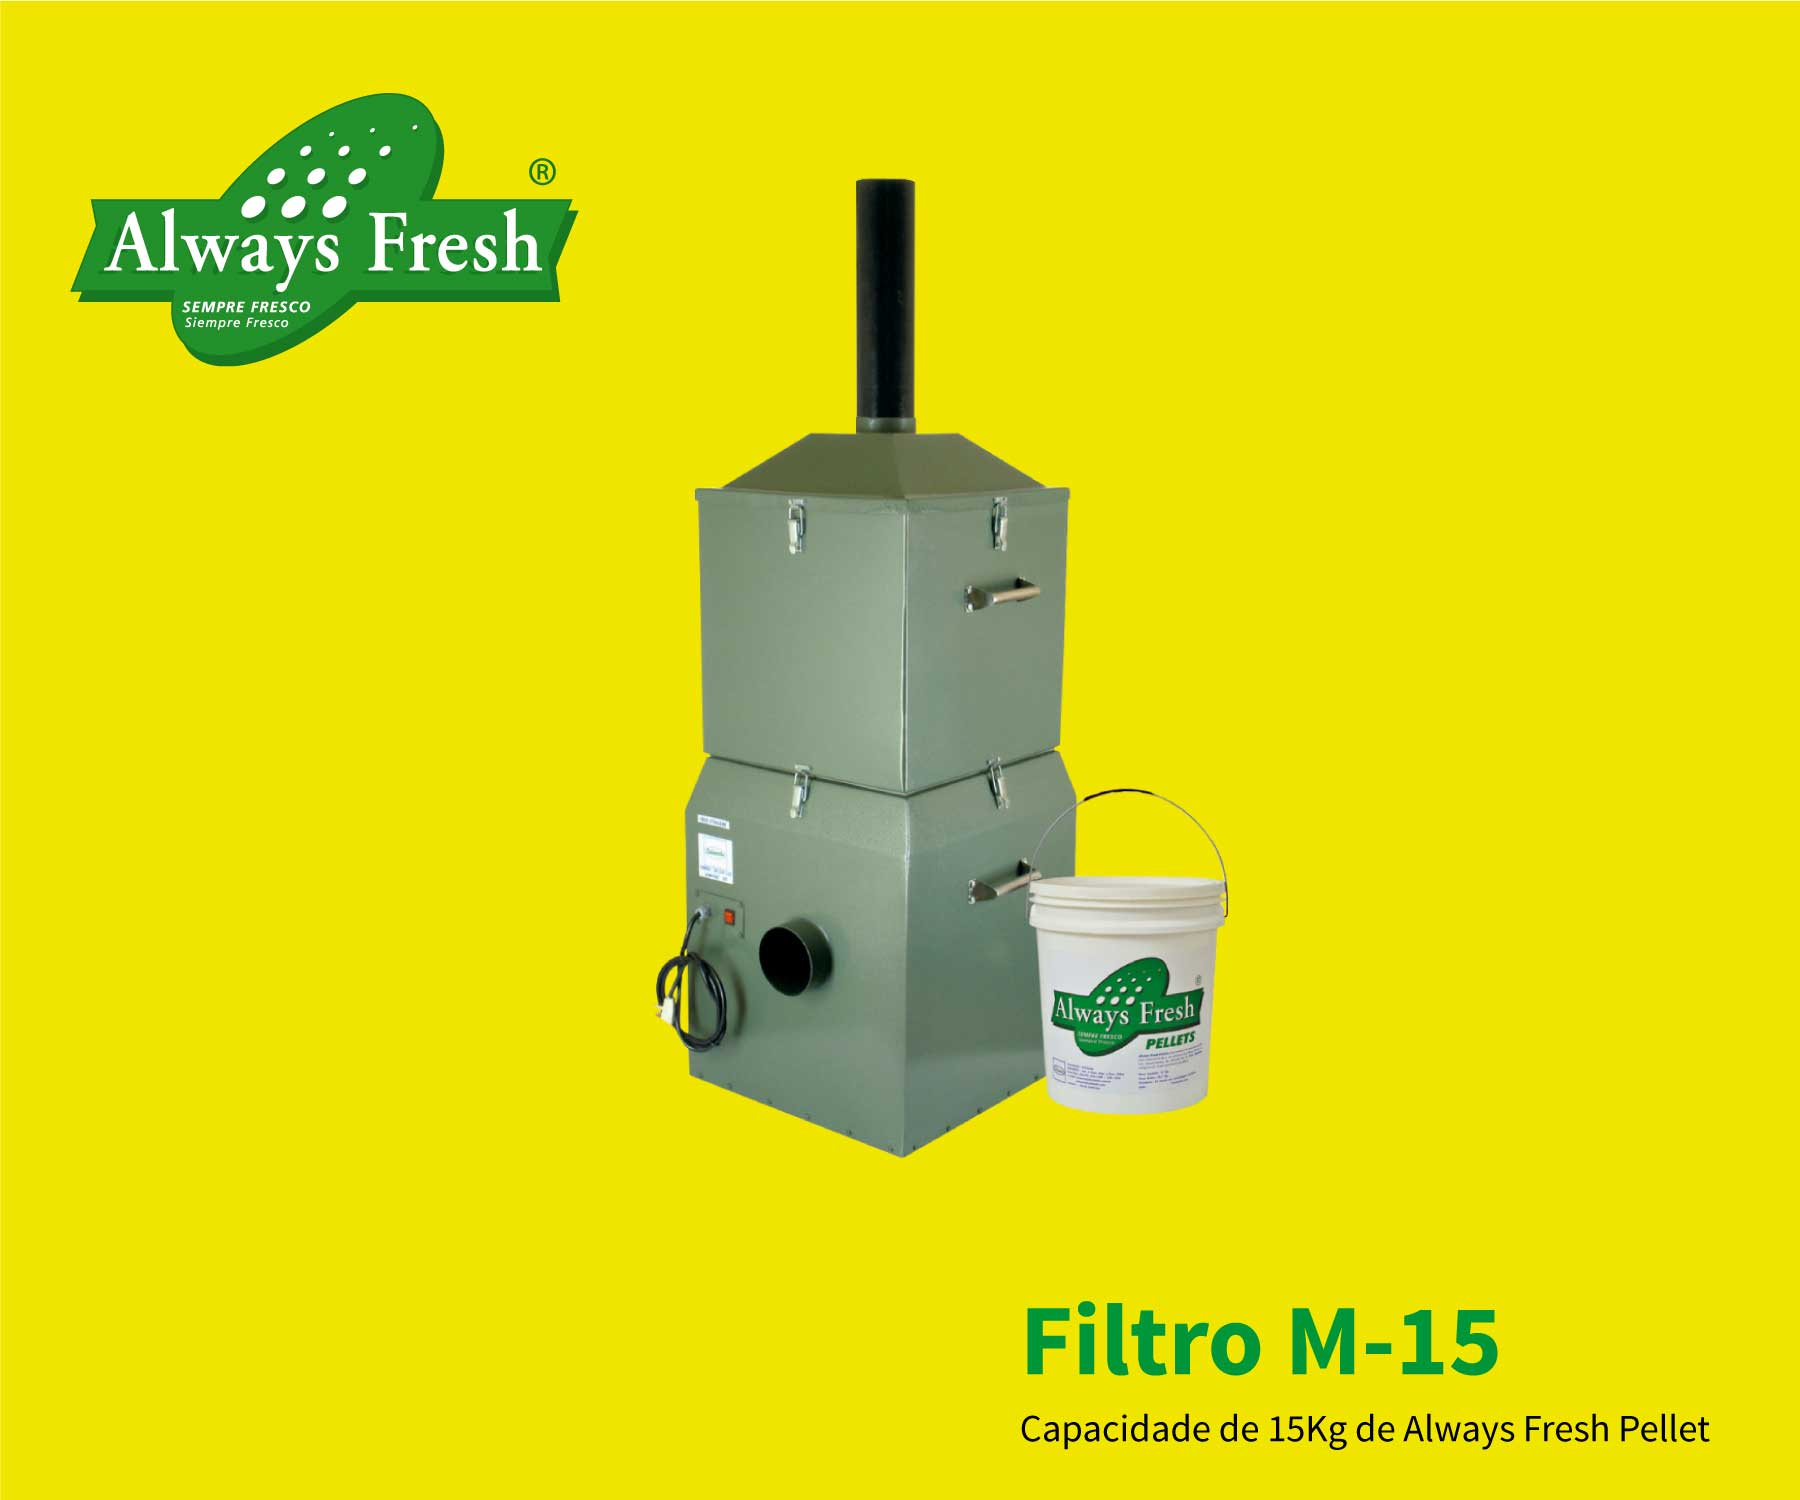 Filtro Always Fresh Free Ethylene M-15 e M-60 absorvedores de etileno